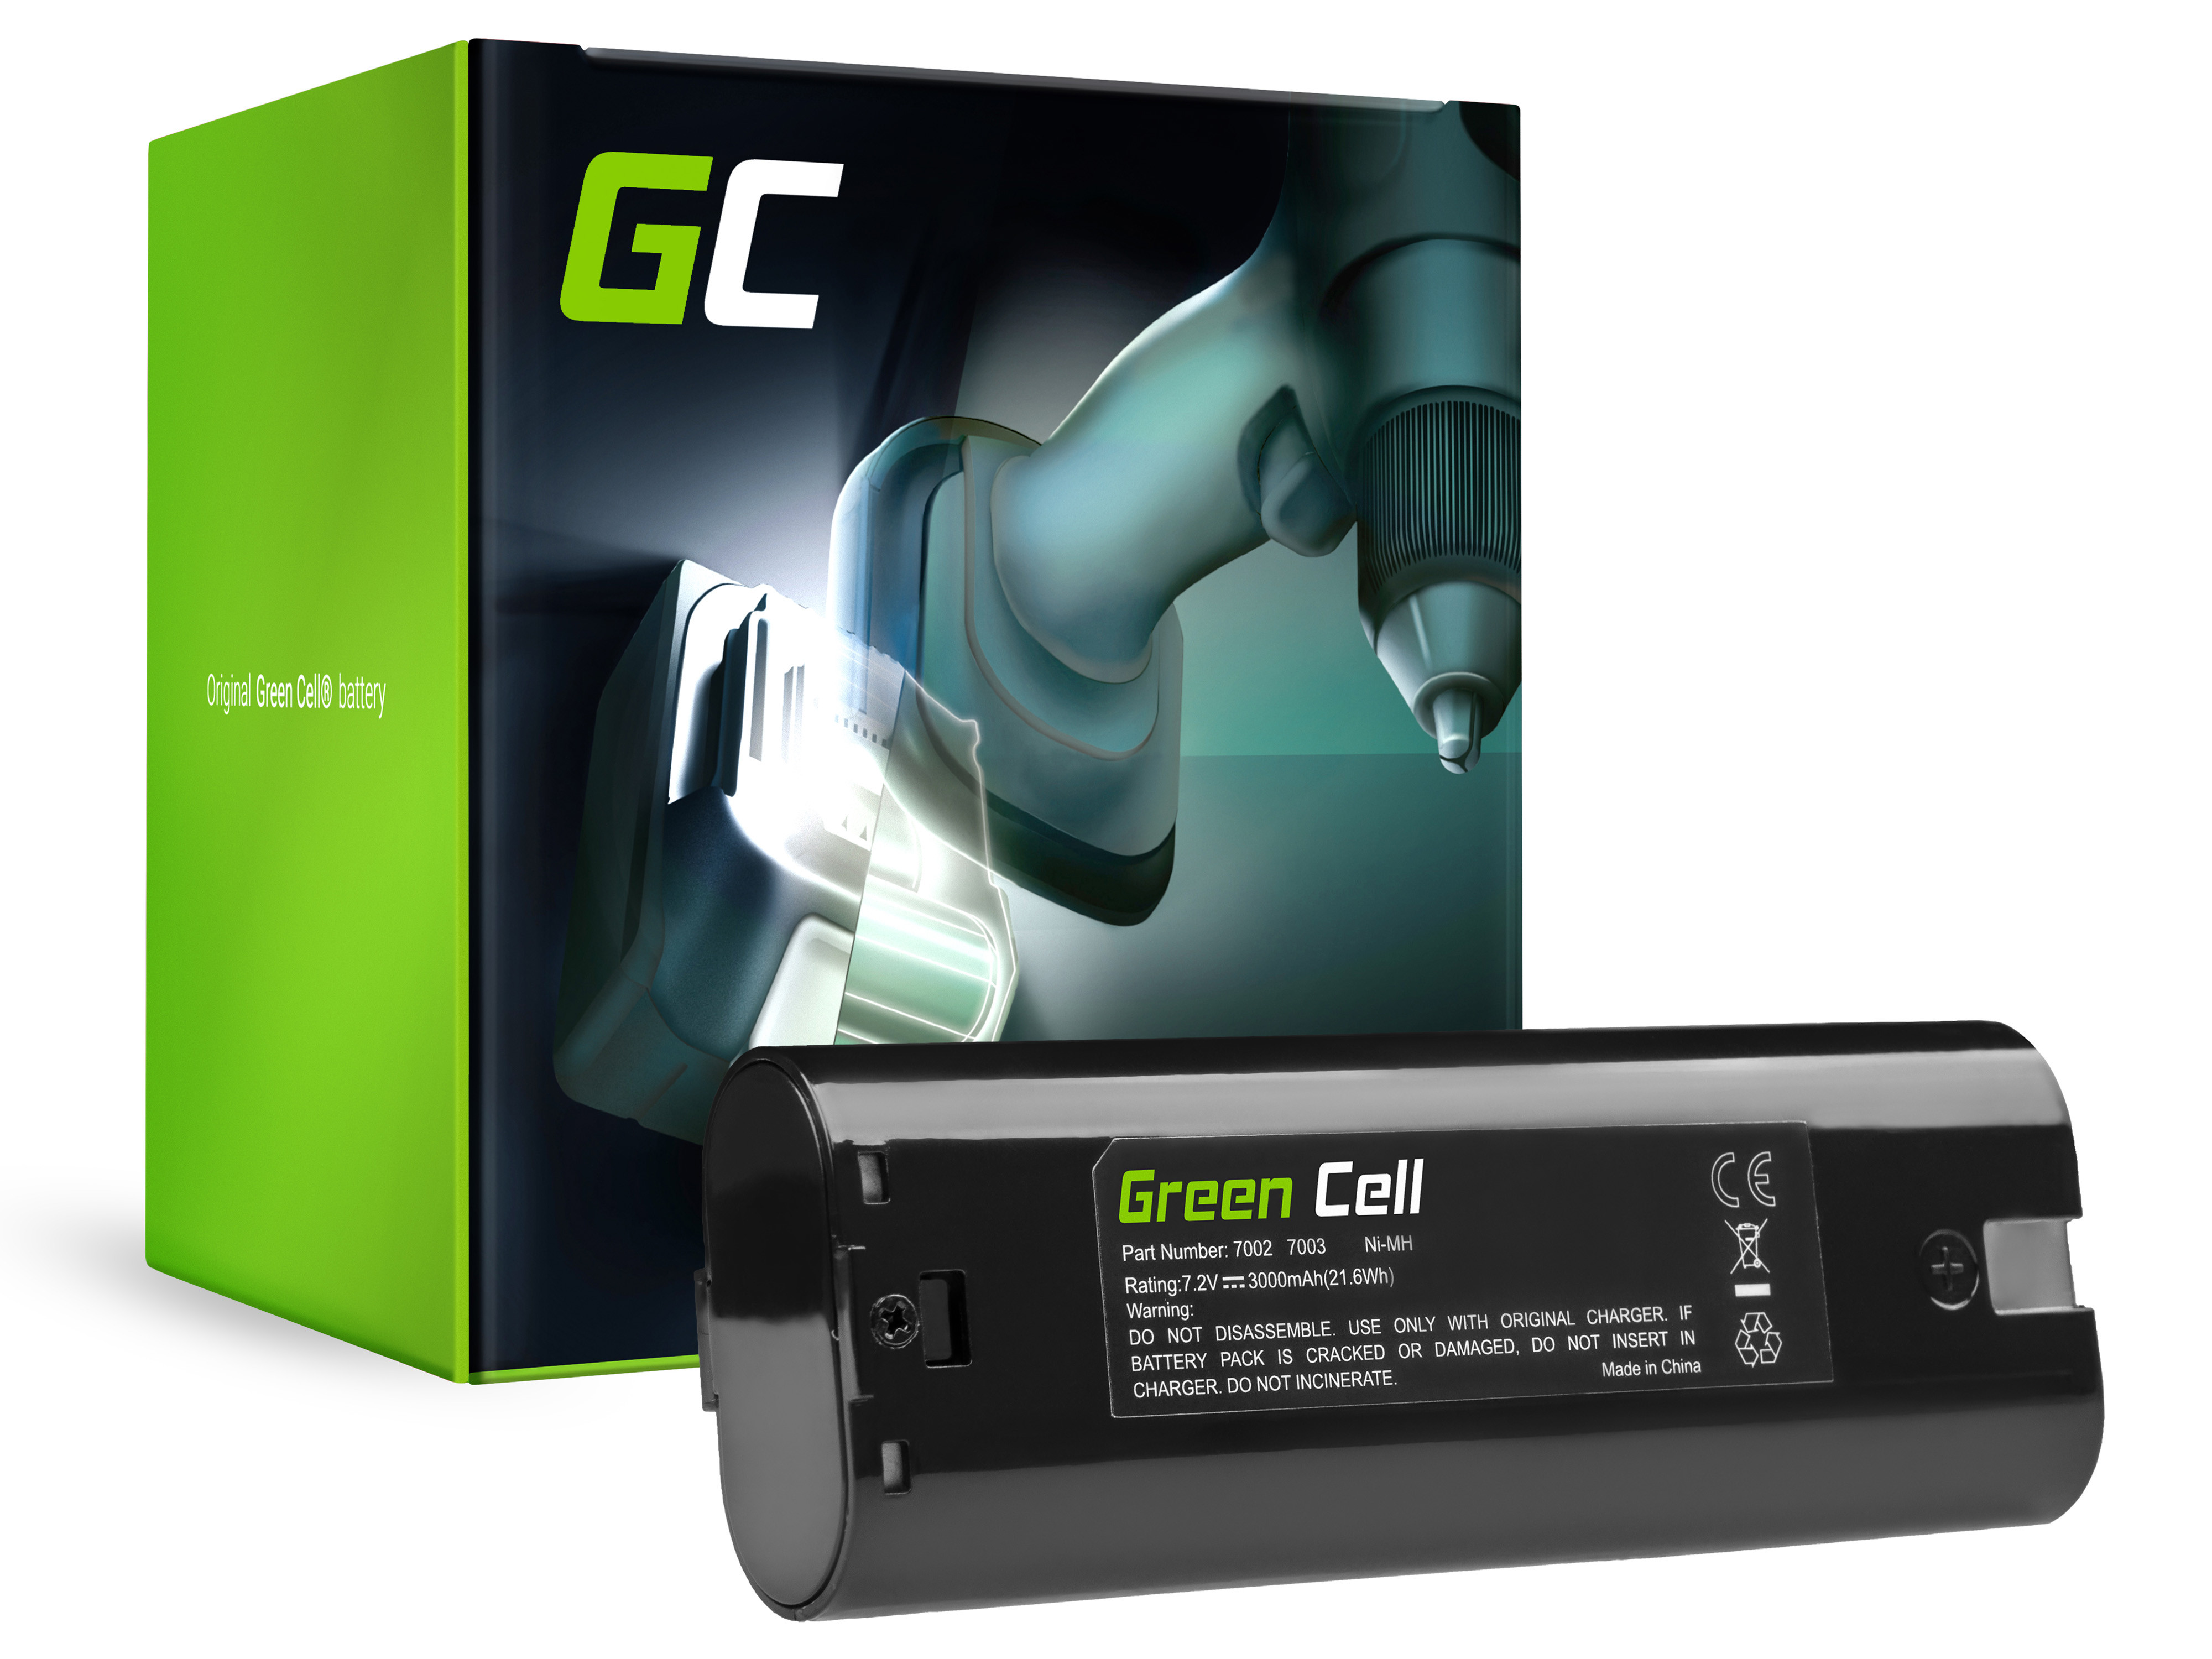 Baterie Green Cell Makita ML700 ML701 ML702 3700D 4071D 6002D 6072D 9035D 9500D 3000mAh 7.2V 3000mAh Ni-MH – neoriginální